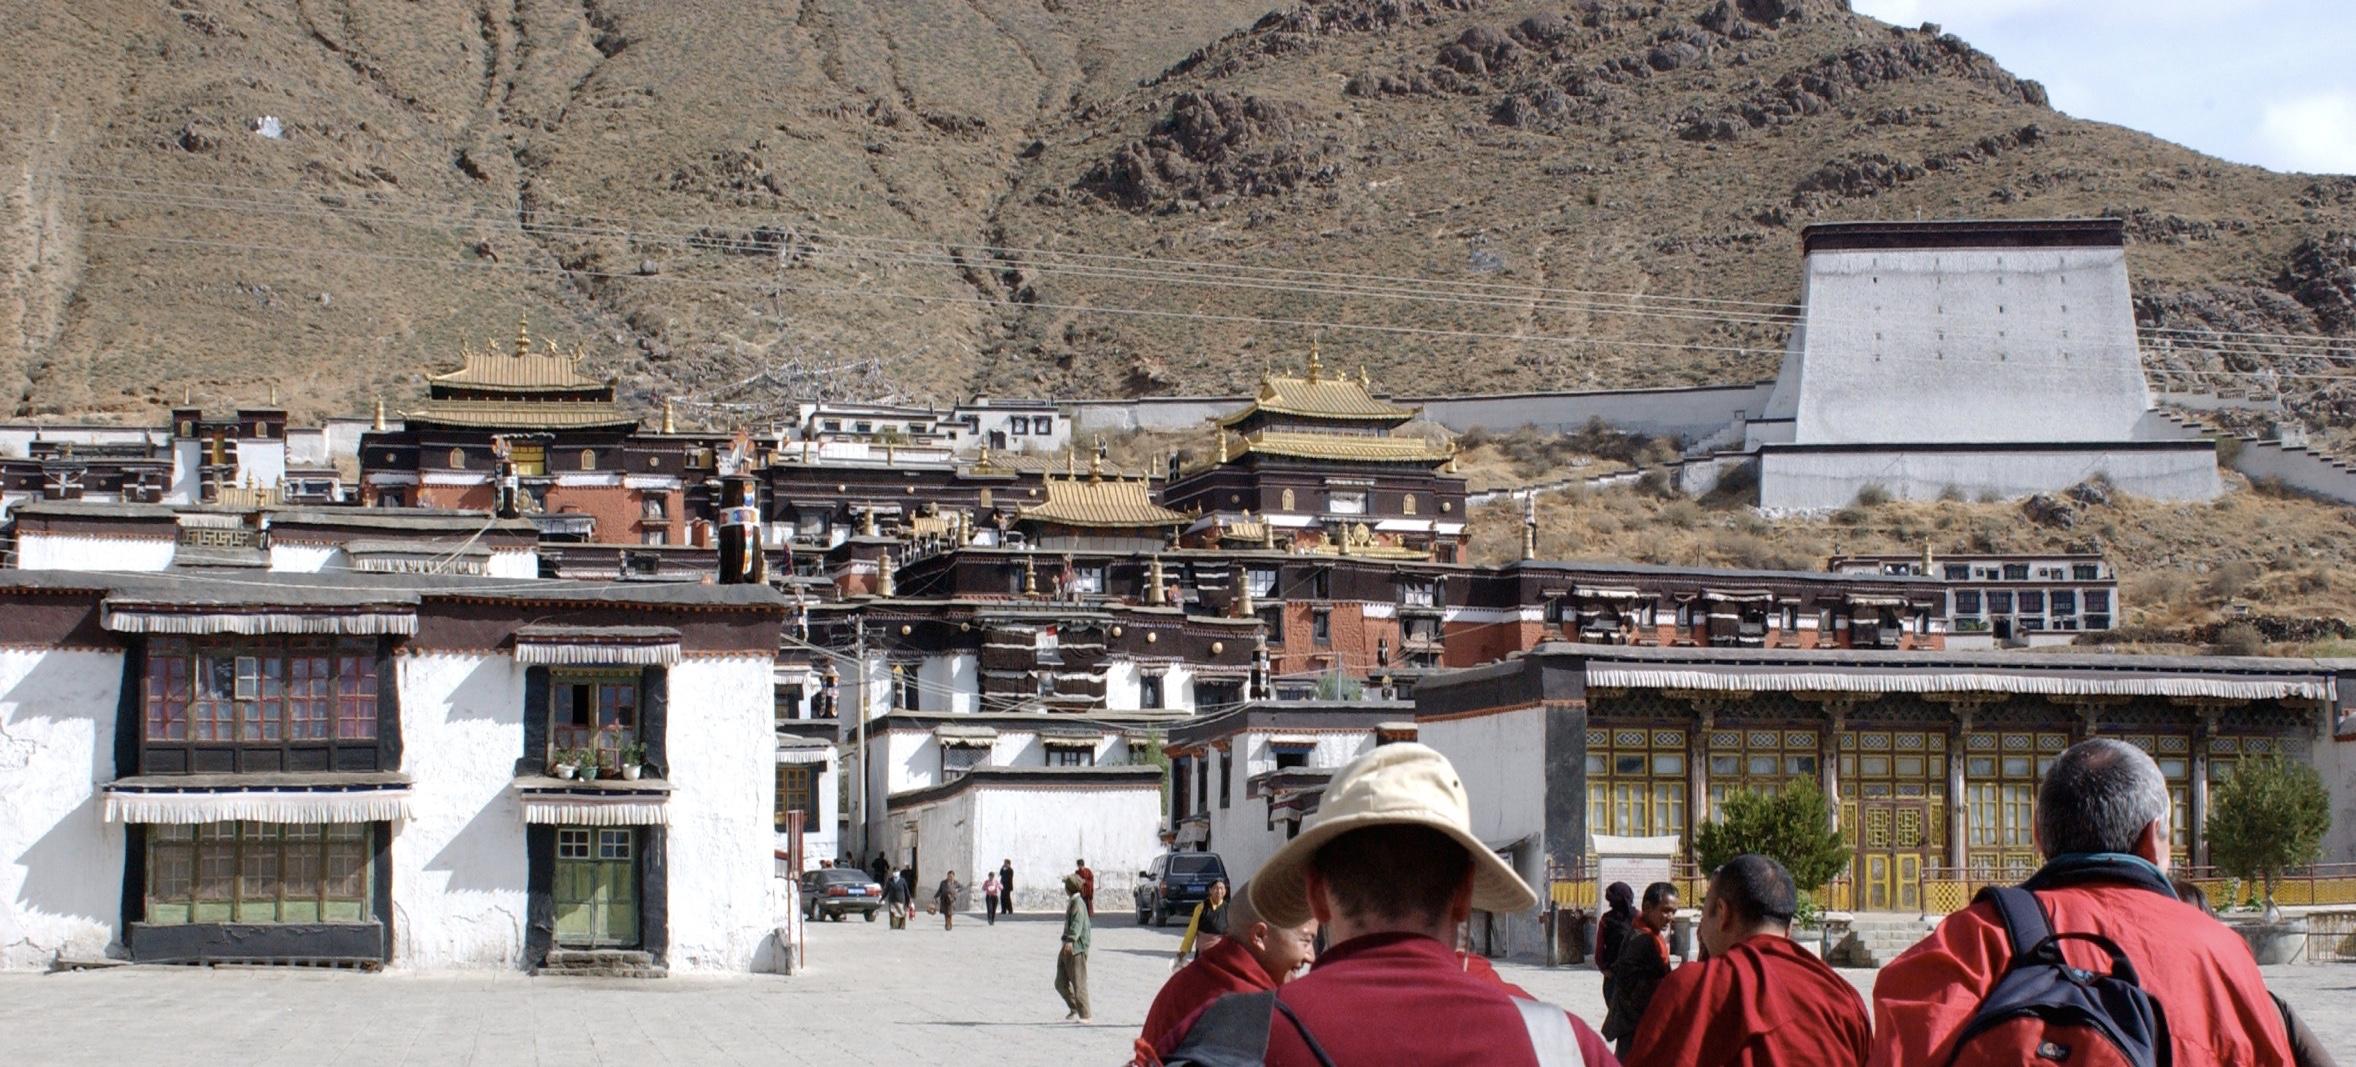 Outside the Panchen Lama's monastery Tashi Lhunpo, in Tibet. (Photo Bob Cayton)